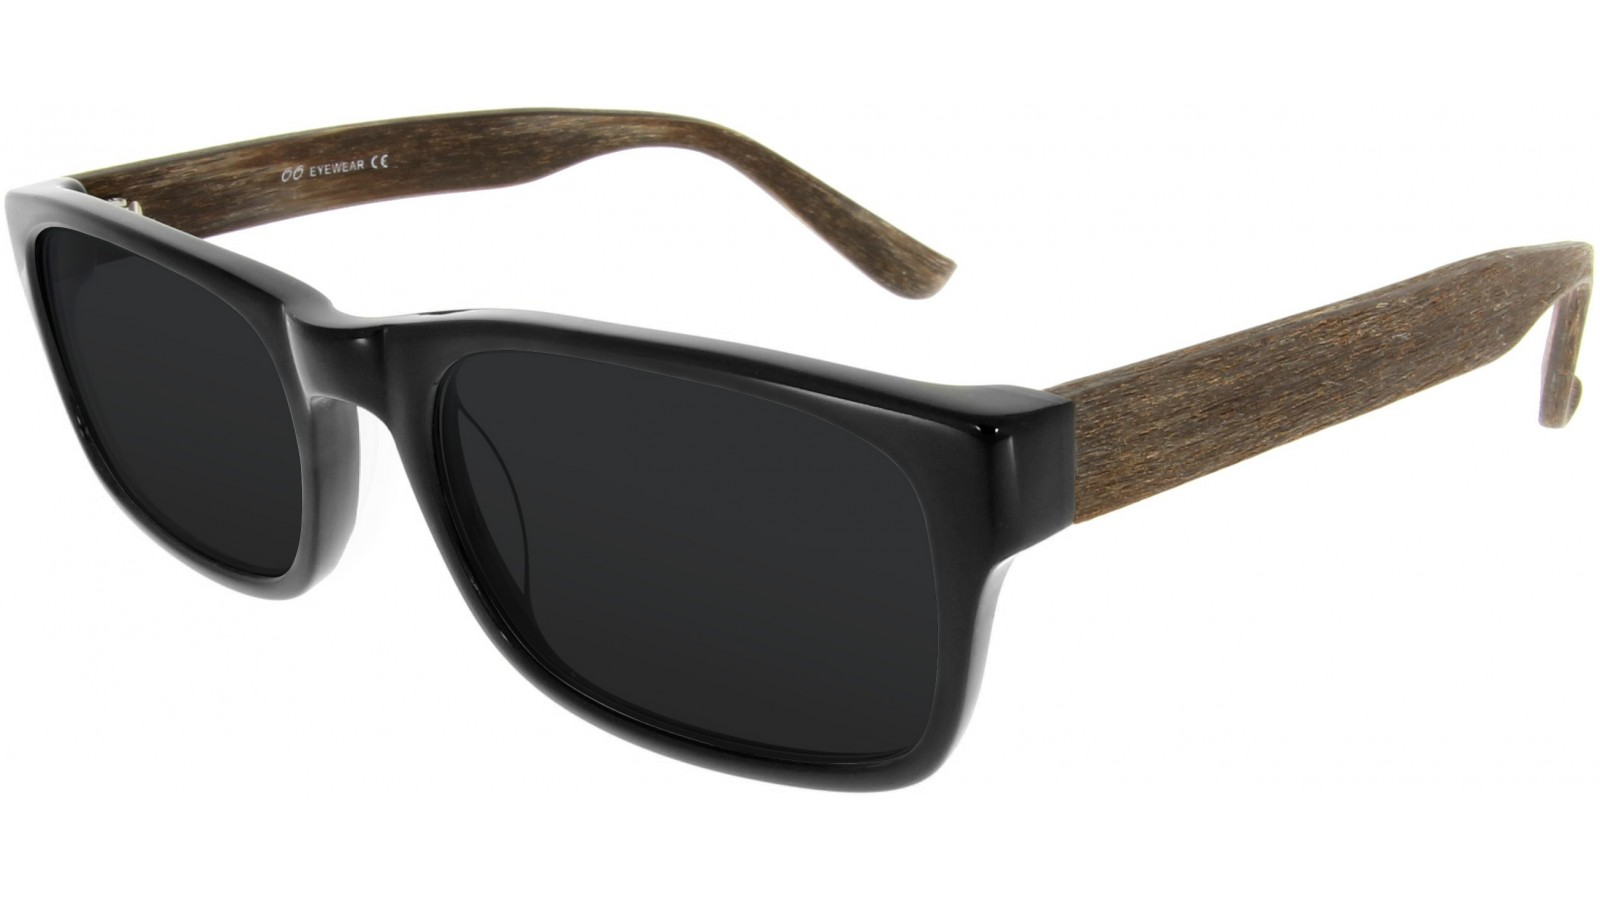 ray ban sonnenbrille herren holzoptik